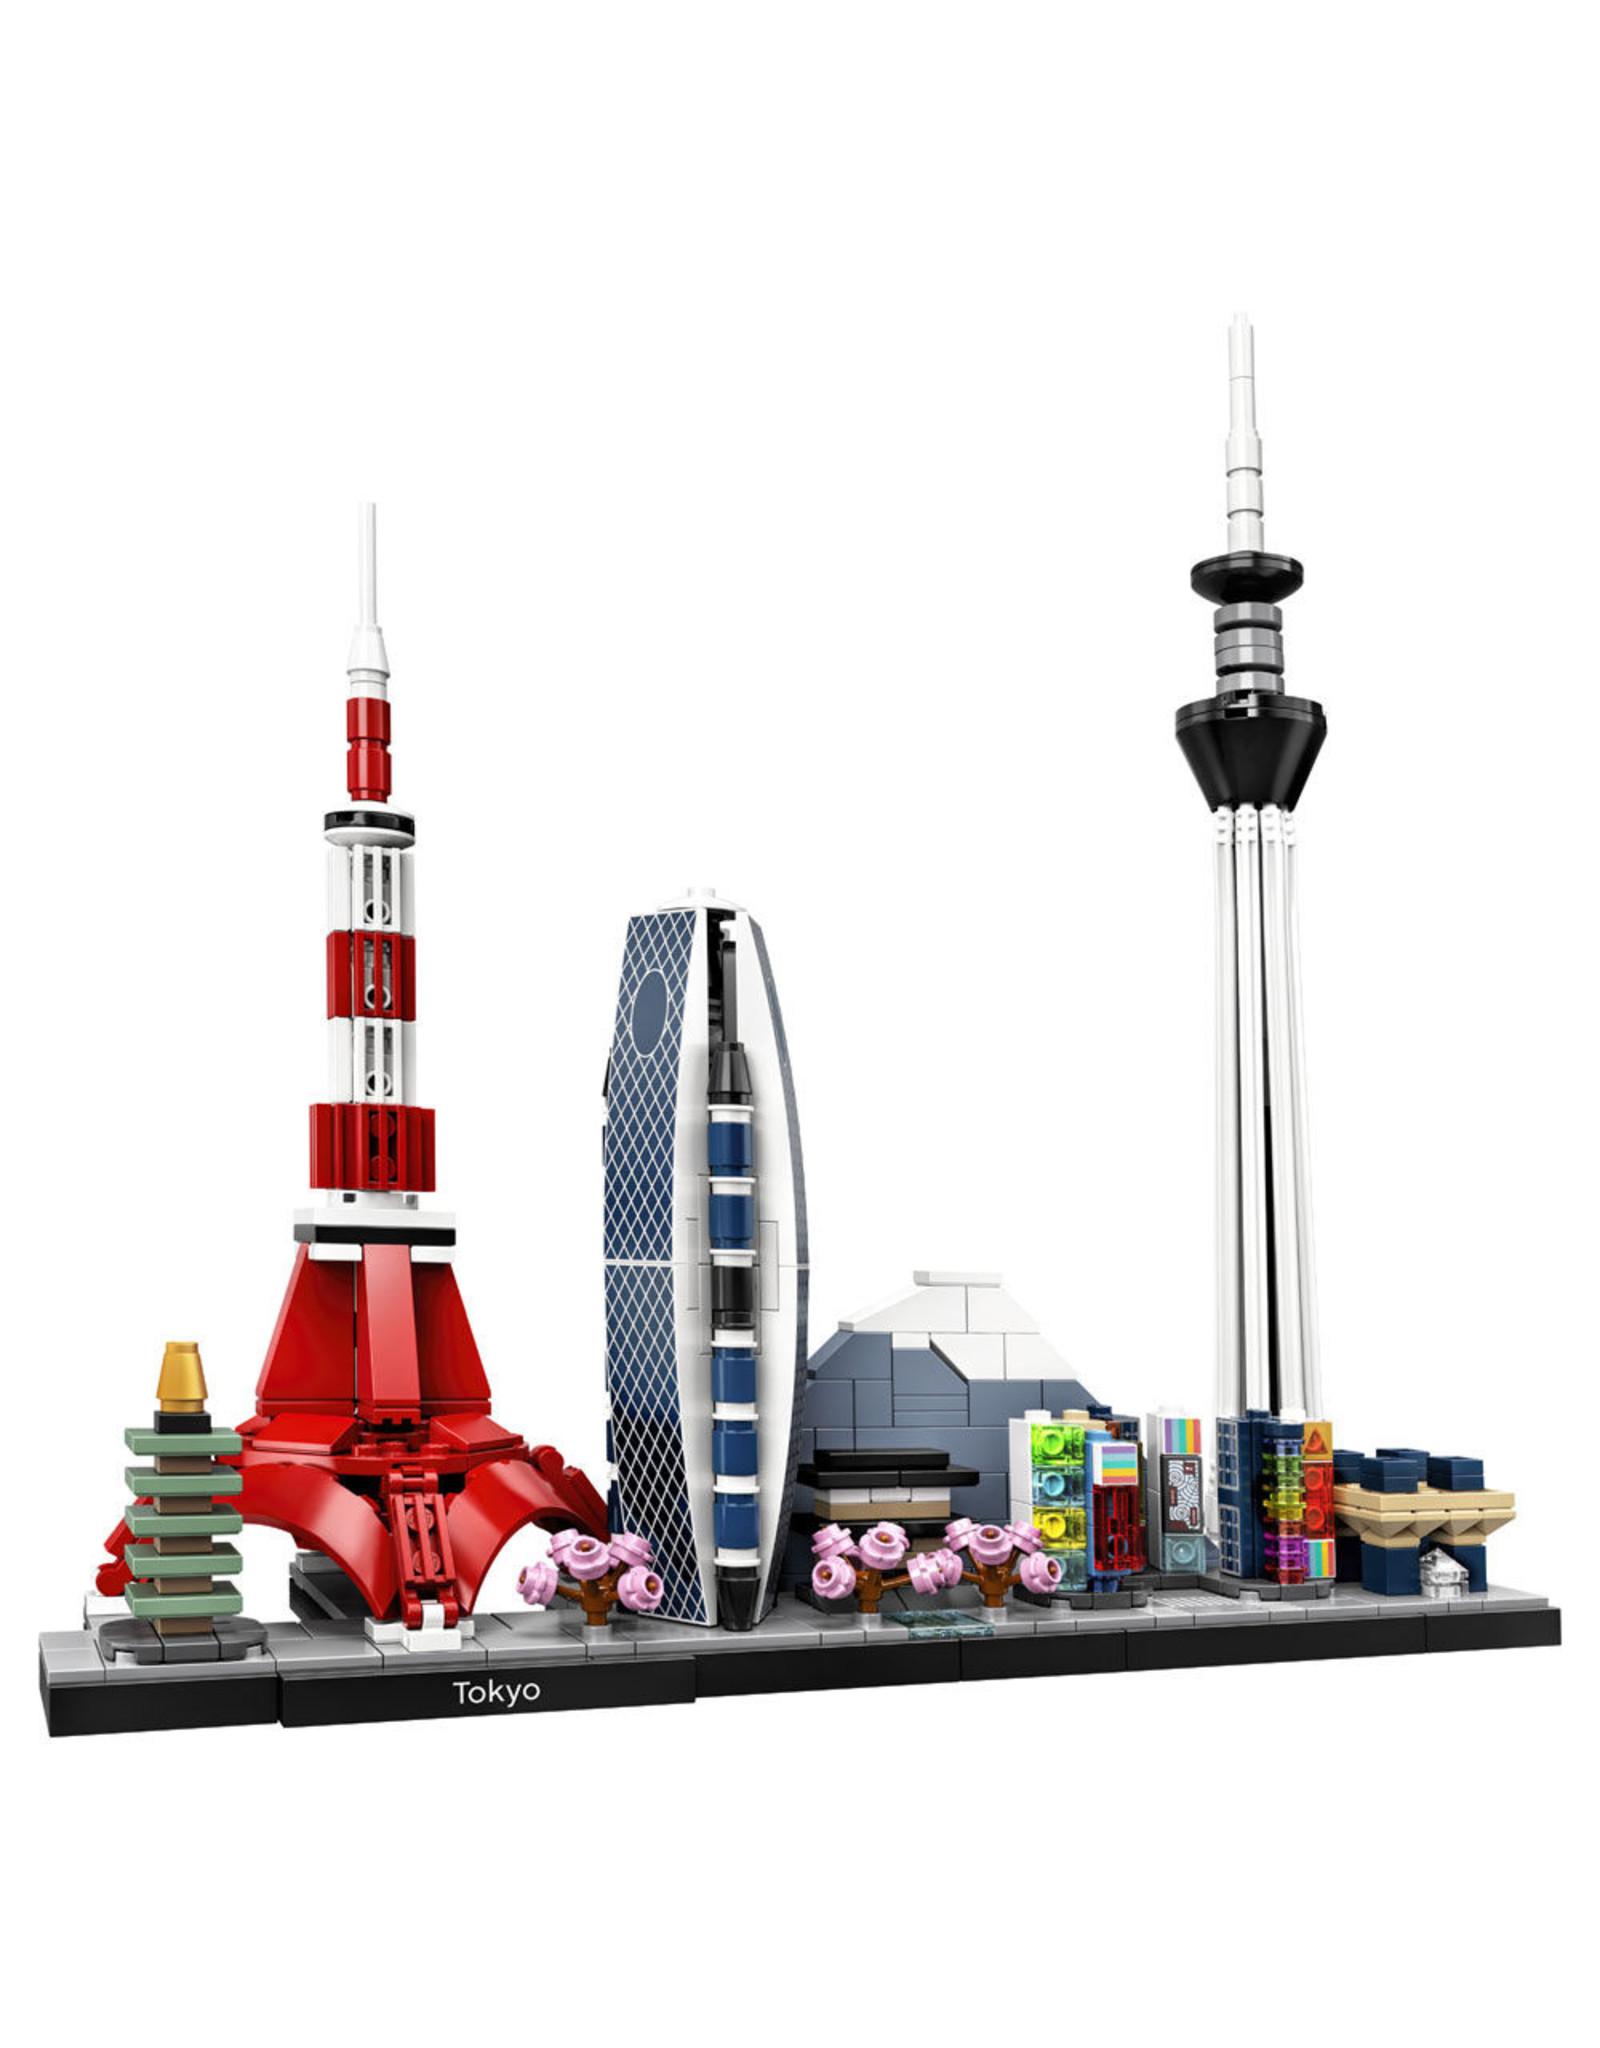 LEGO Architecture - 21051 - Tokyo